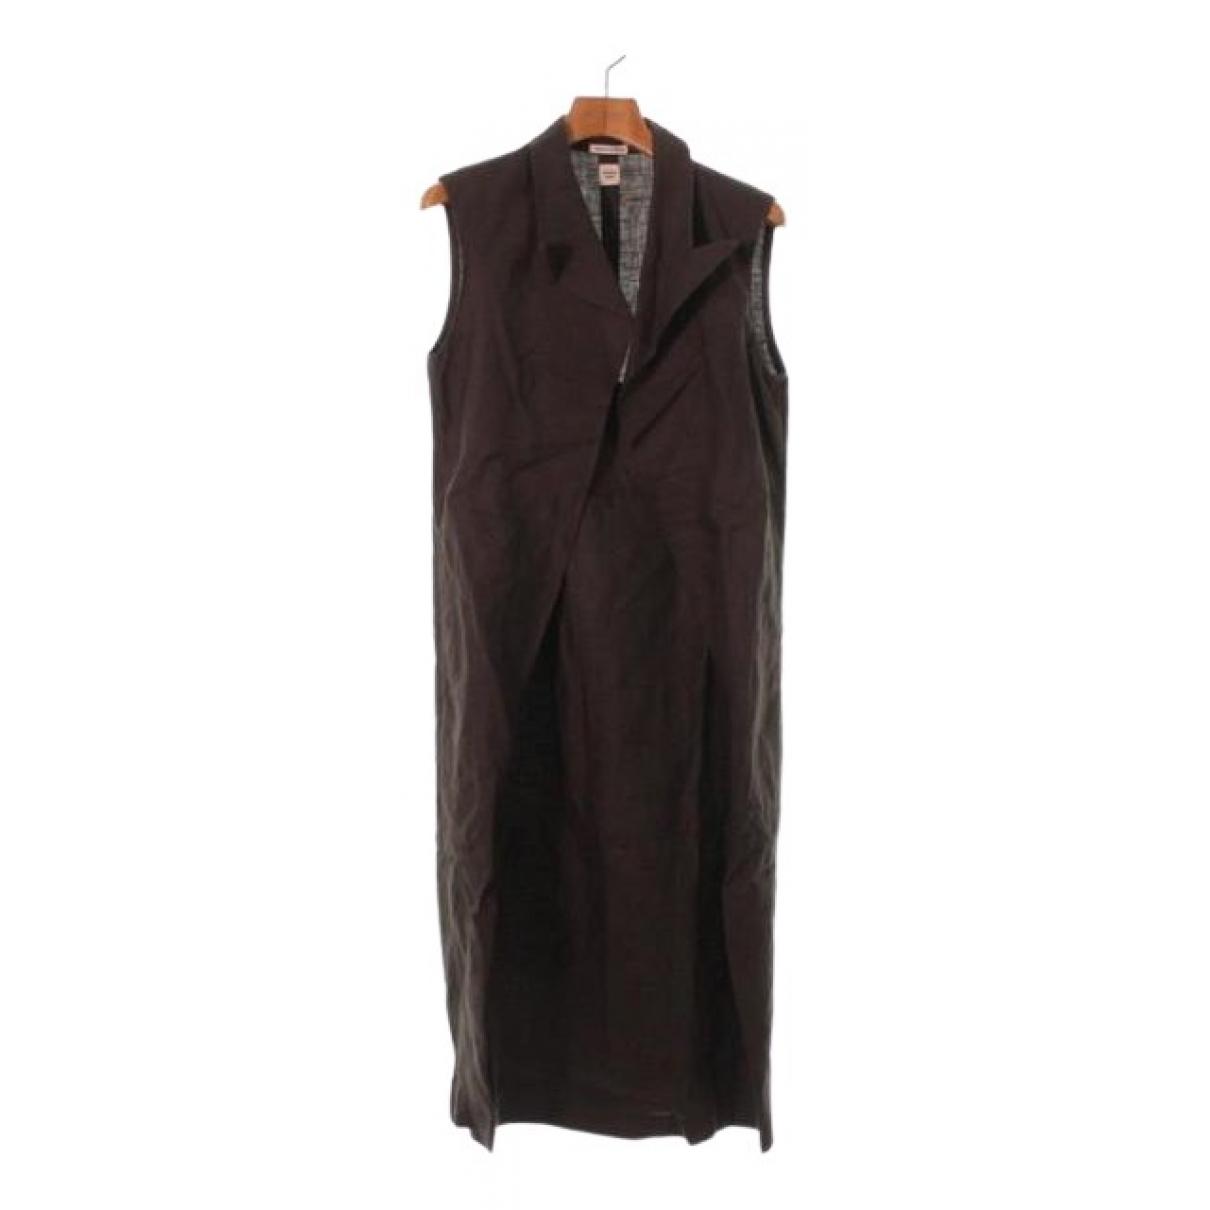 Hermès \N Brown Linen dress for Women 34 FR